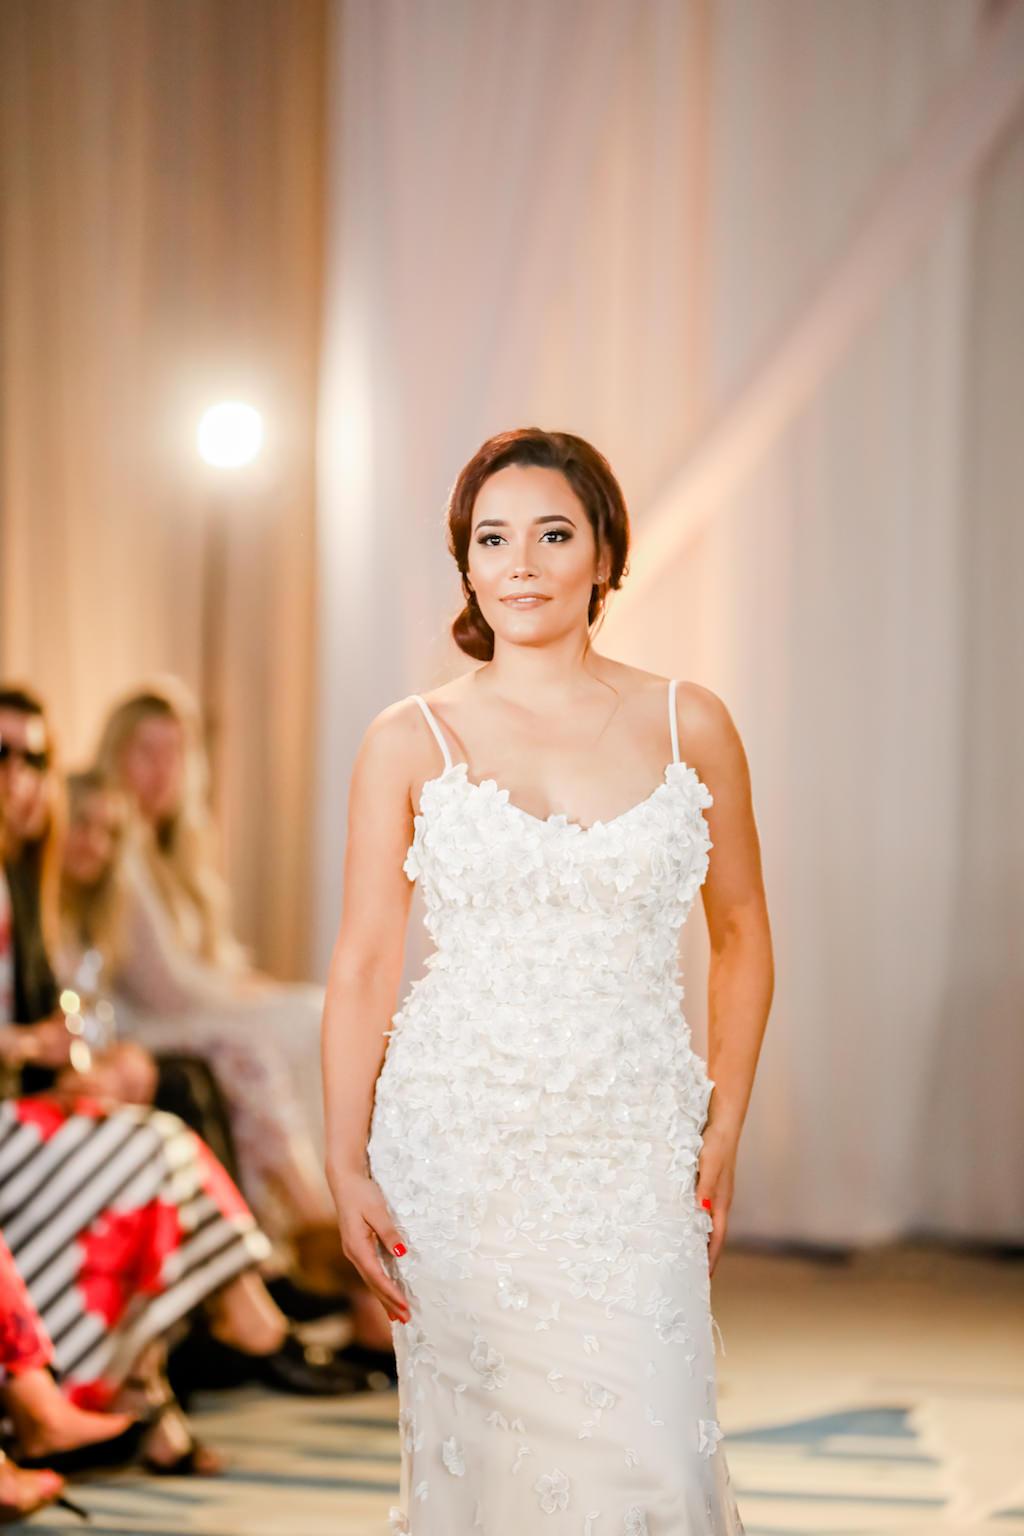 White, Floral Detailed, White Wedding Dress   Designer Matthew Christopher   Truly Forever Bridal   The Ritz Carlton Sarasota   Planner NK Weddings